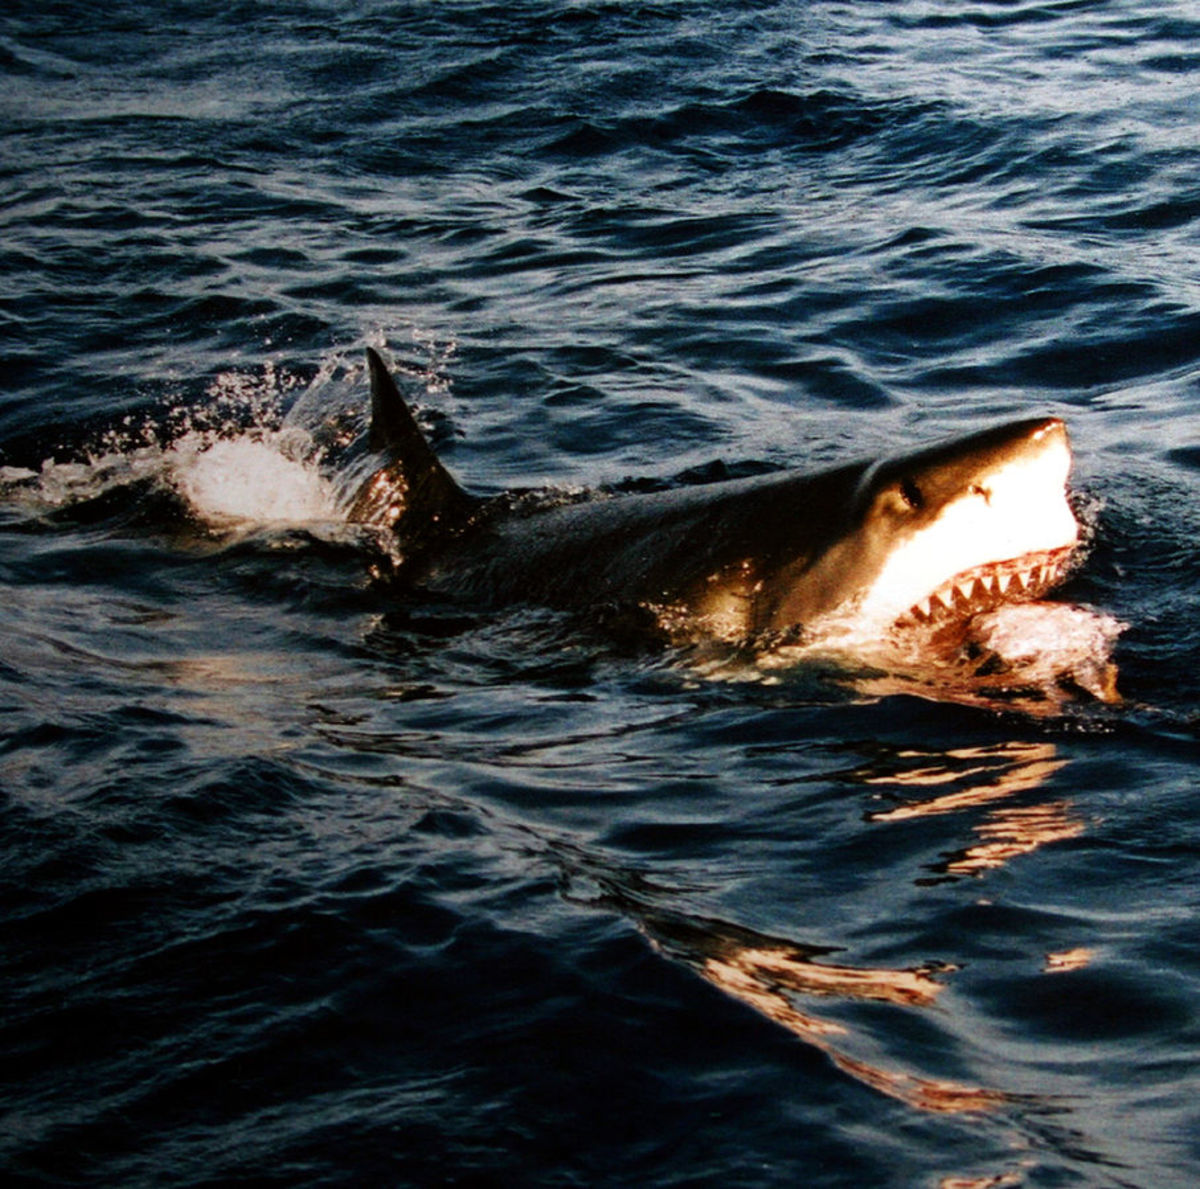 Shark Terror at the Beach